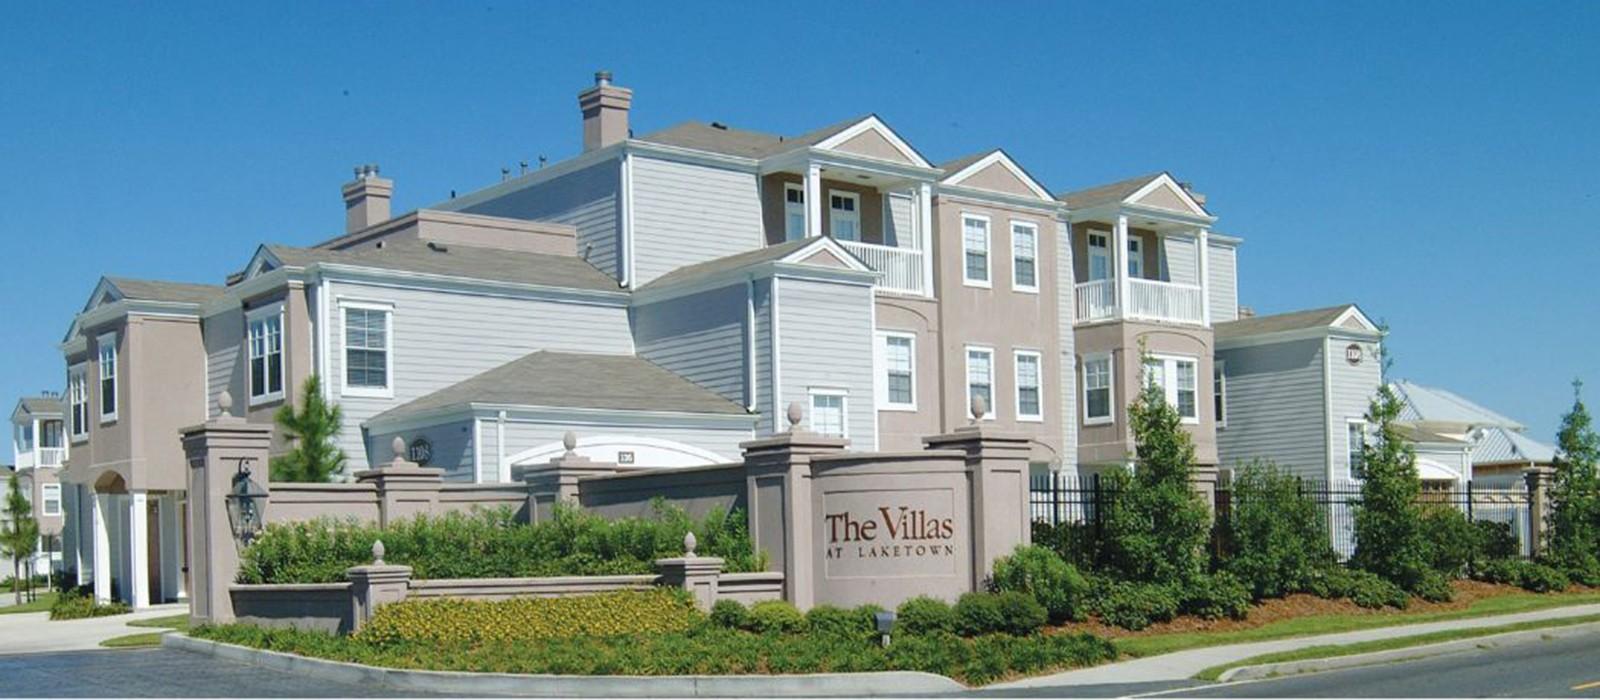 Villas at Laketown Apartments in Kenner, LA - 1 & 2 Bedroom ...